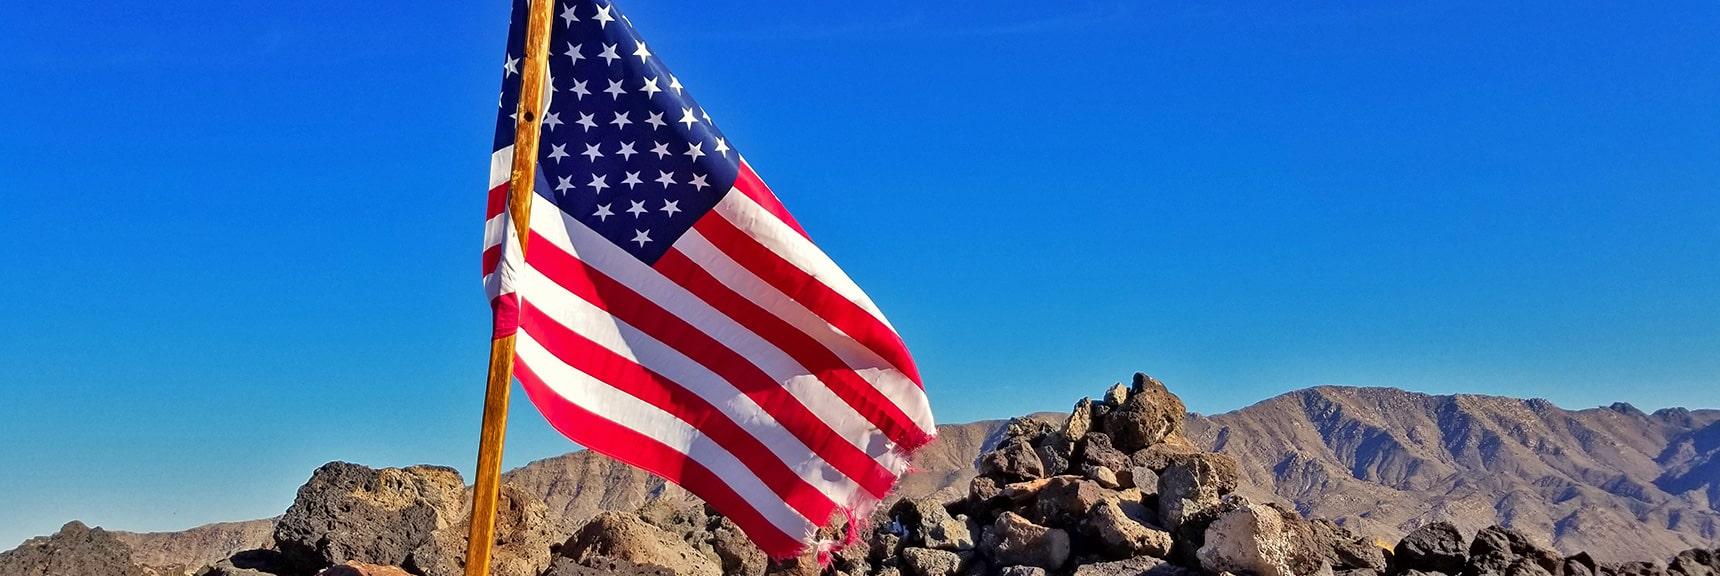 Wind Torn Flag on Fortification Hill Summit   Fortification Hill   Lake Mead National Recreation Area, Arizona